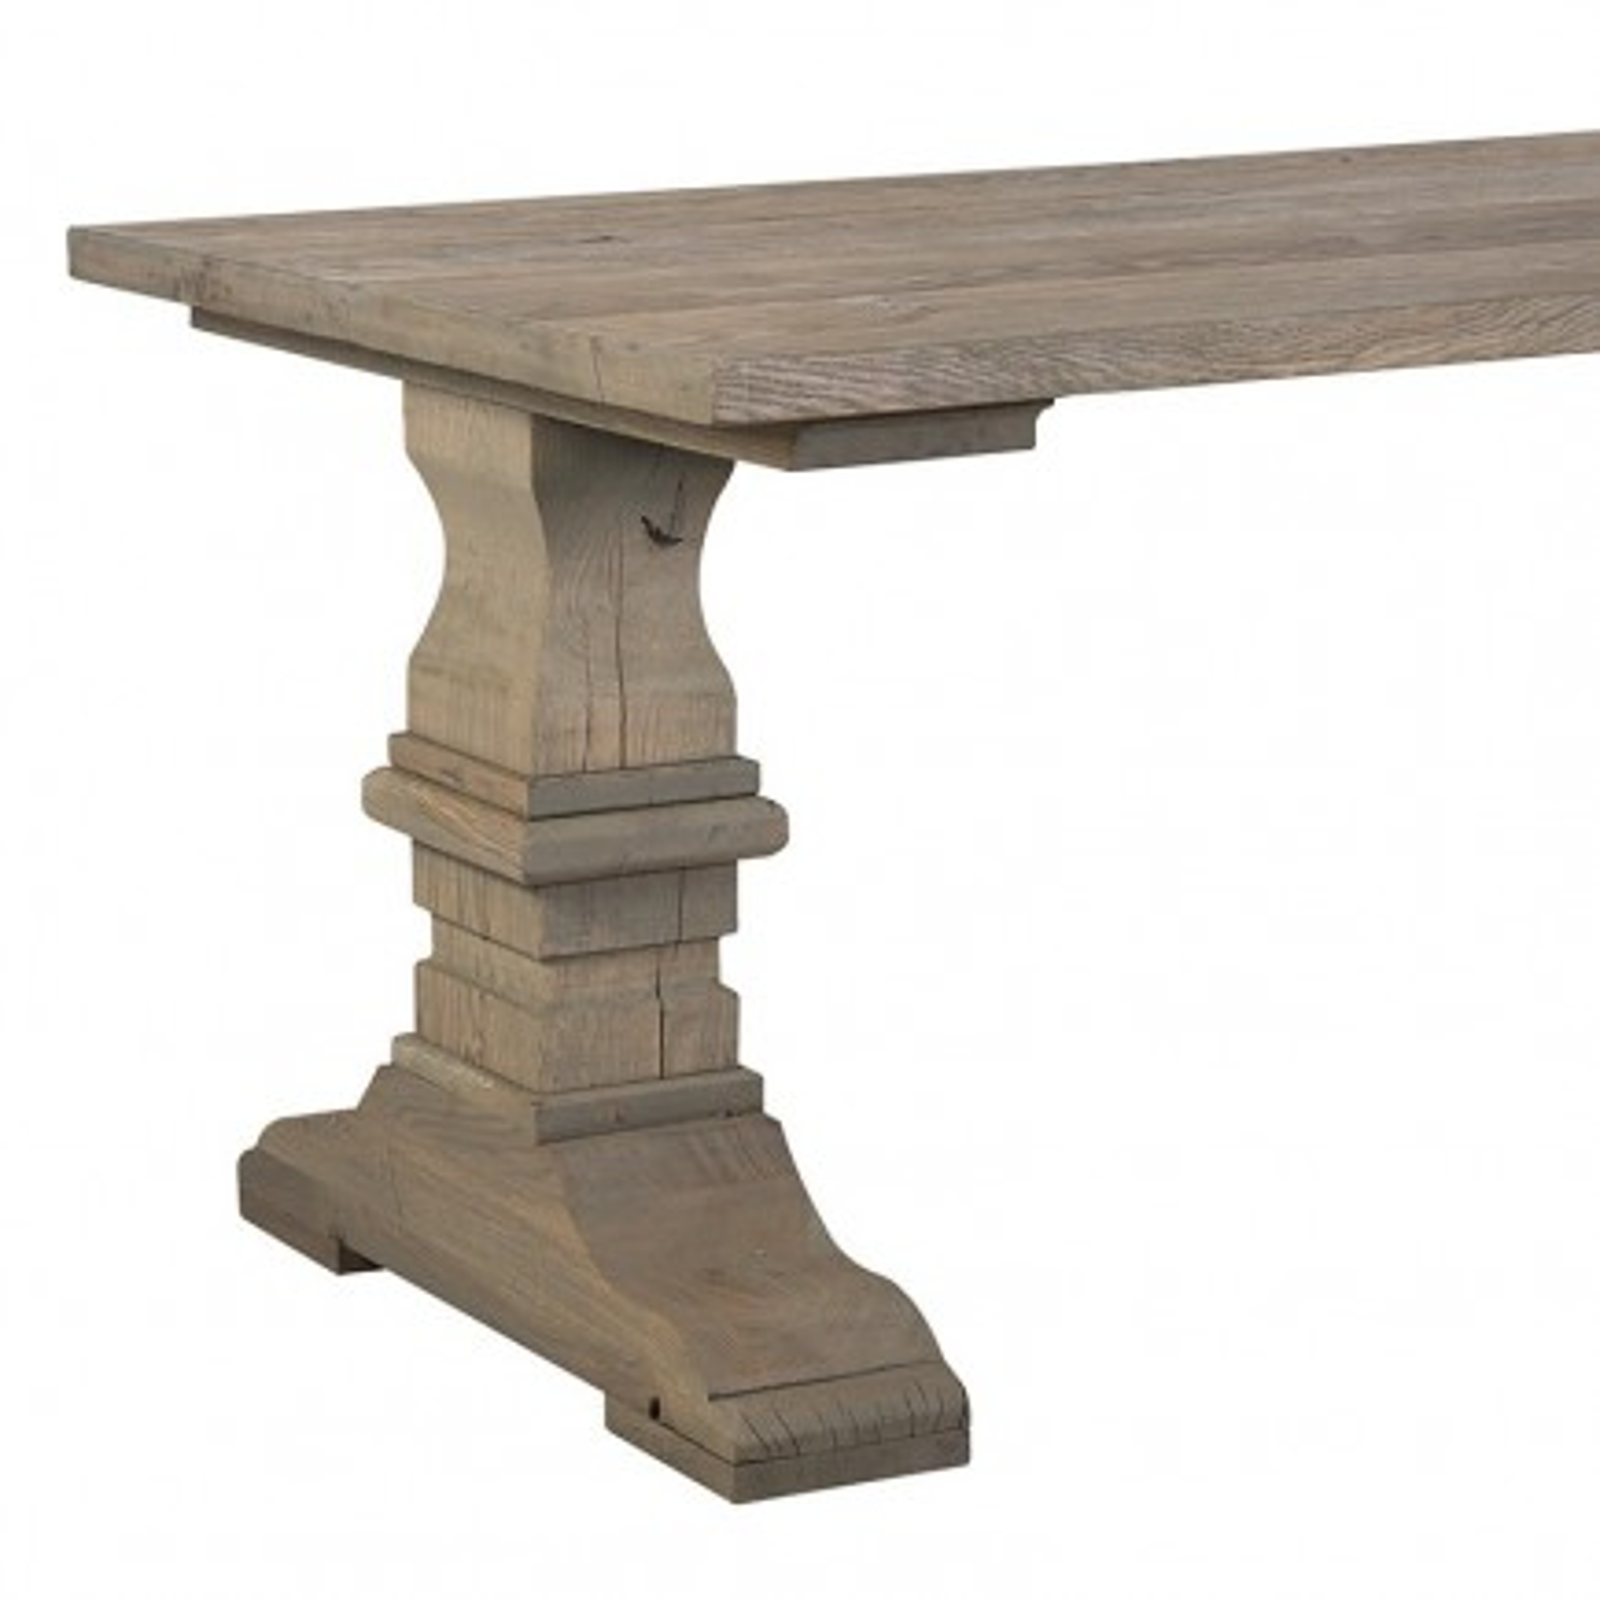 Table de salle Castle Victoria Chêne - achat table style campagne